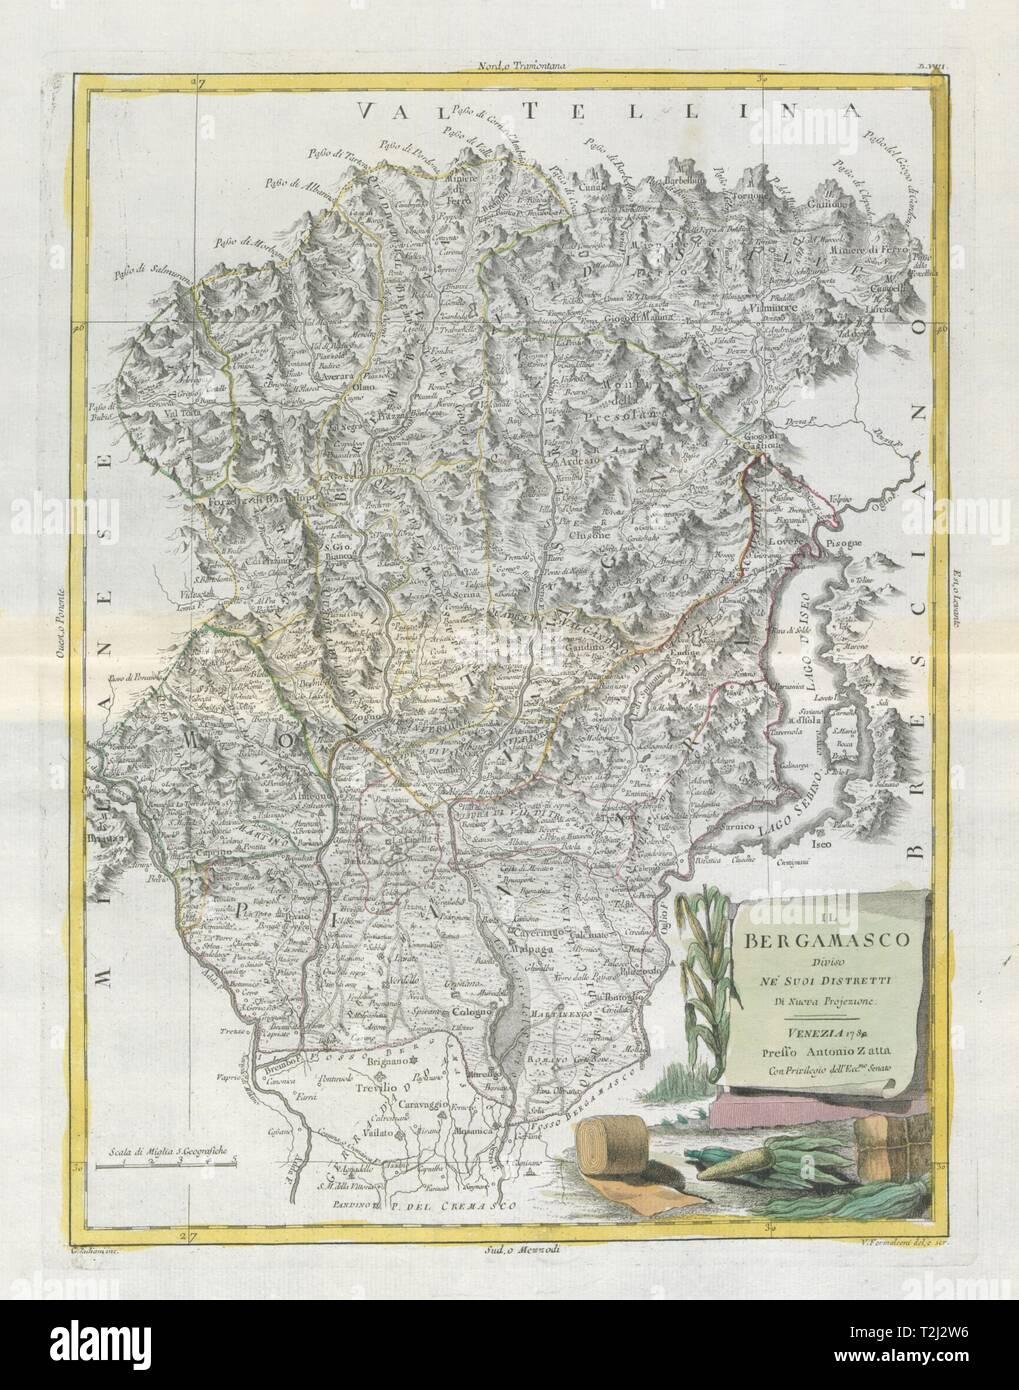 'Il Bergamasco diviso…'. Bergamo province. Lake Iseo. ZATTA 1784 old map - Stock Image